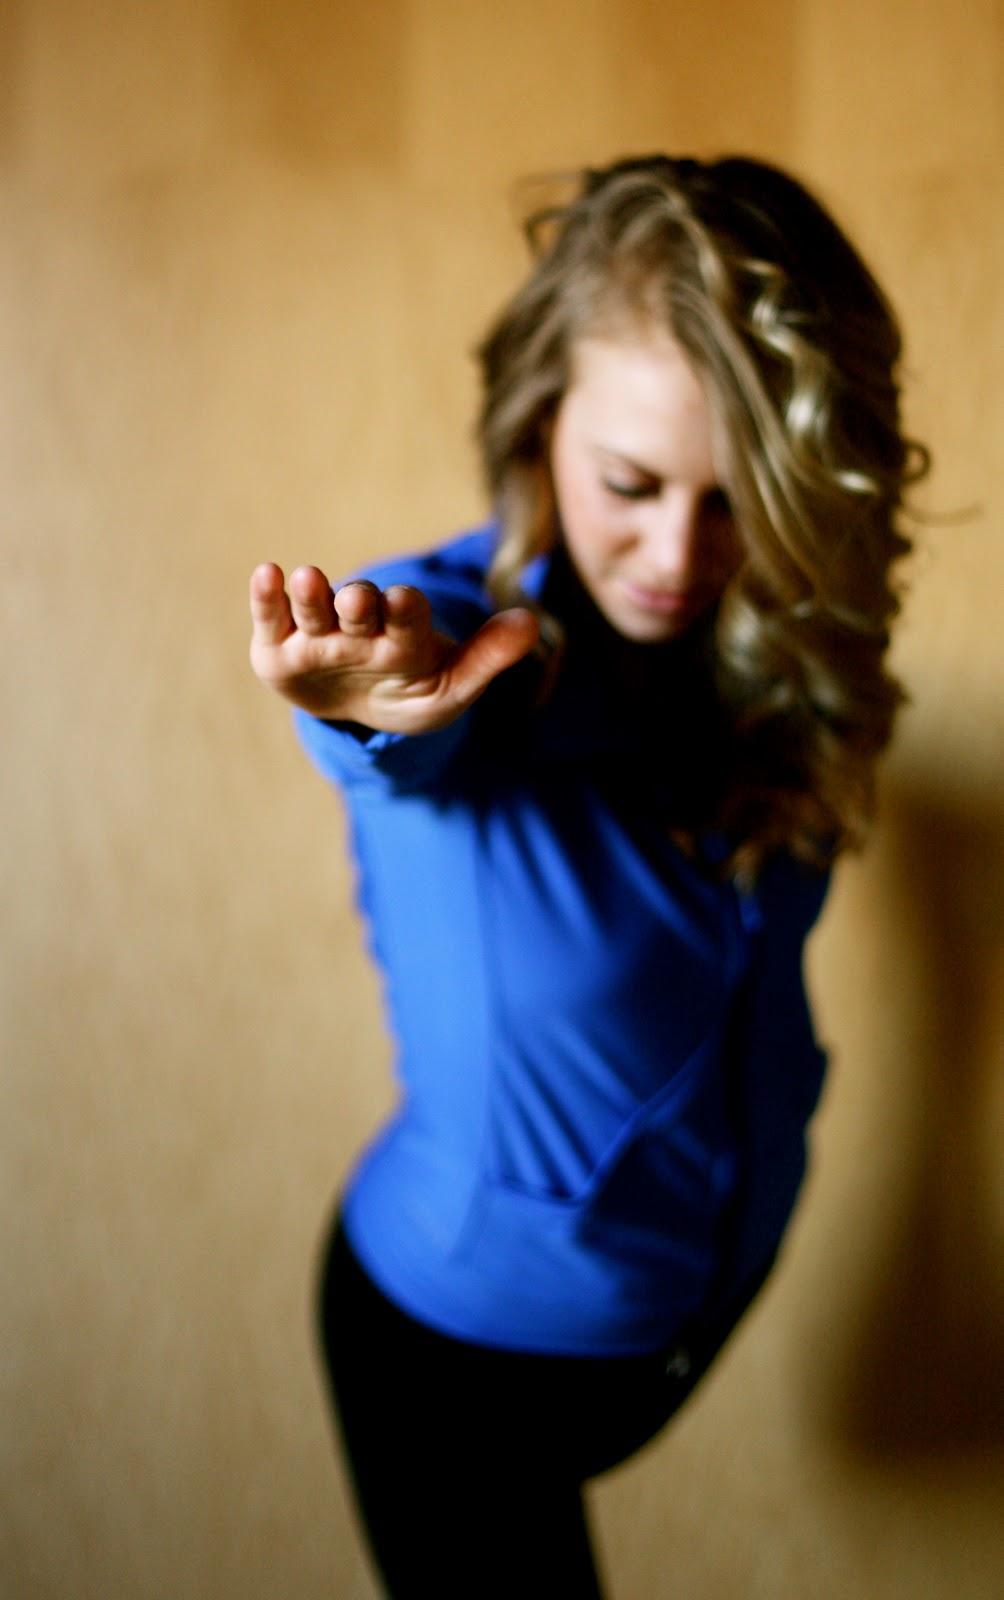 yoga sculpt TT. - Fit Foodie Finds